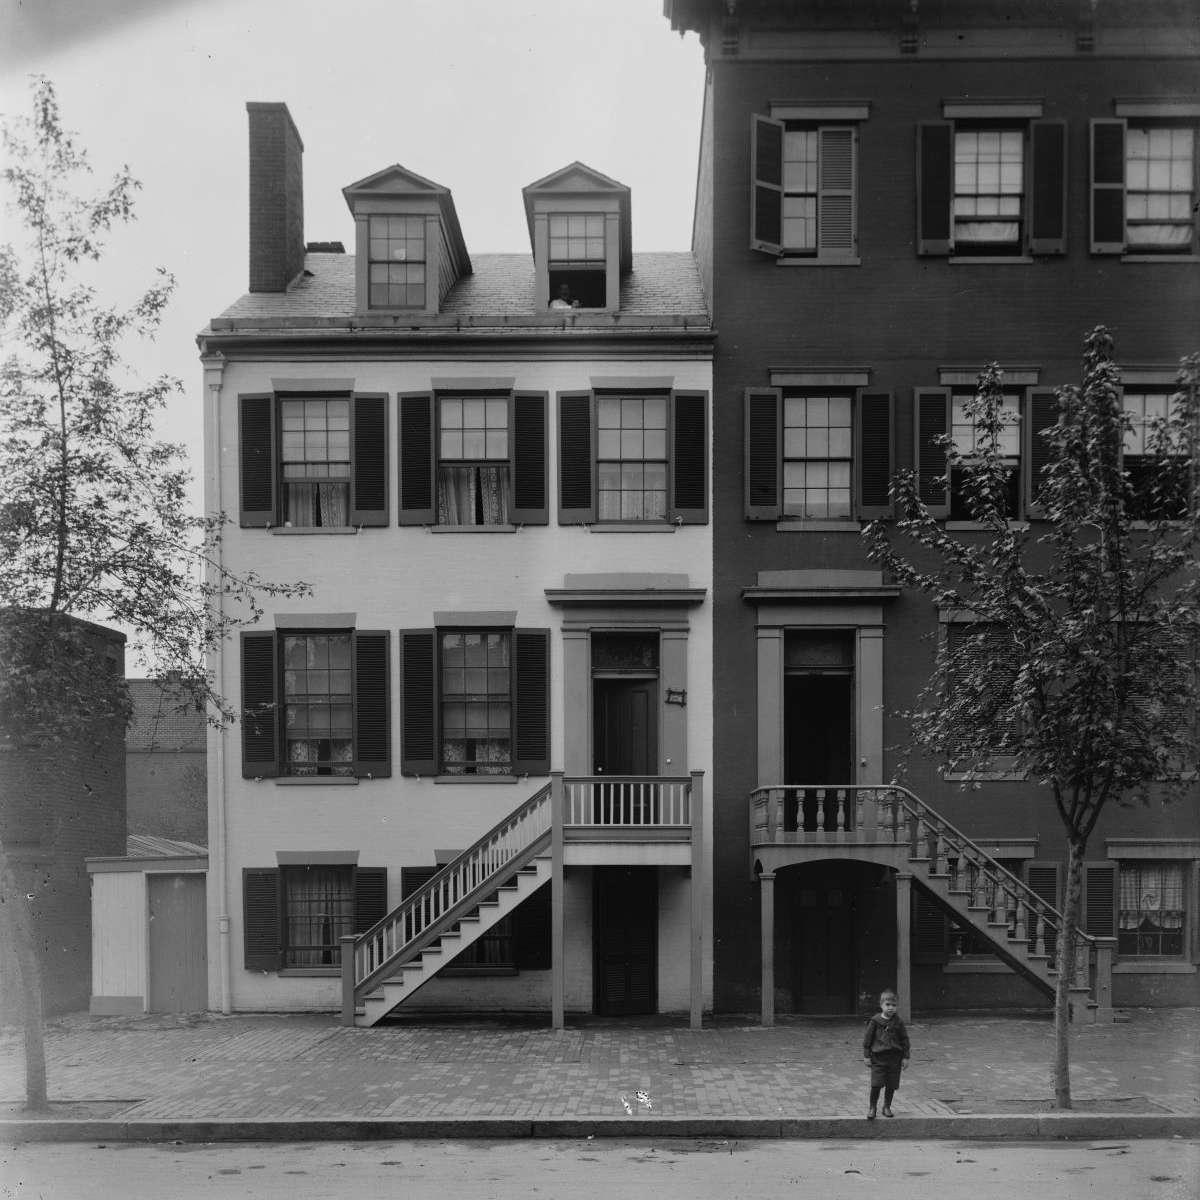 Mrs. Mary Surratt house at 604 H St. N.W. Washington, D.C.